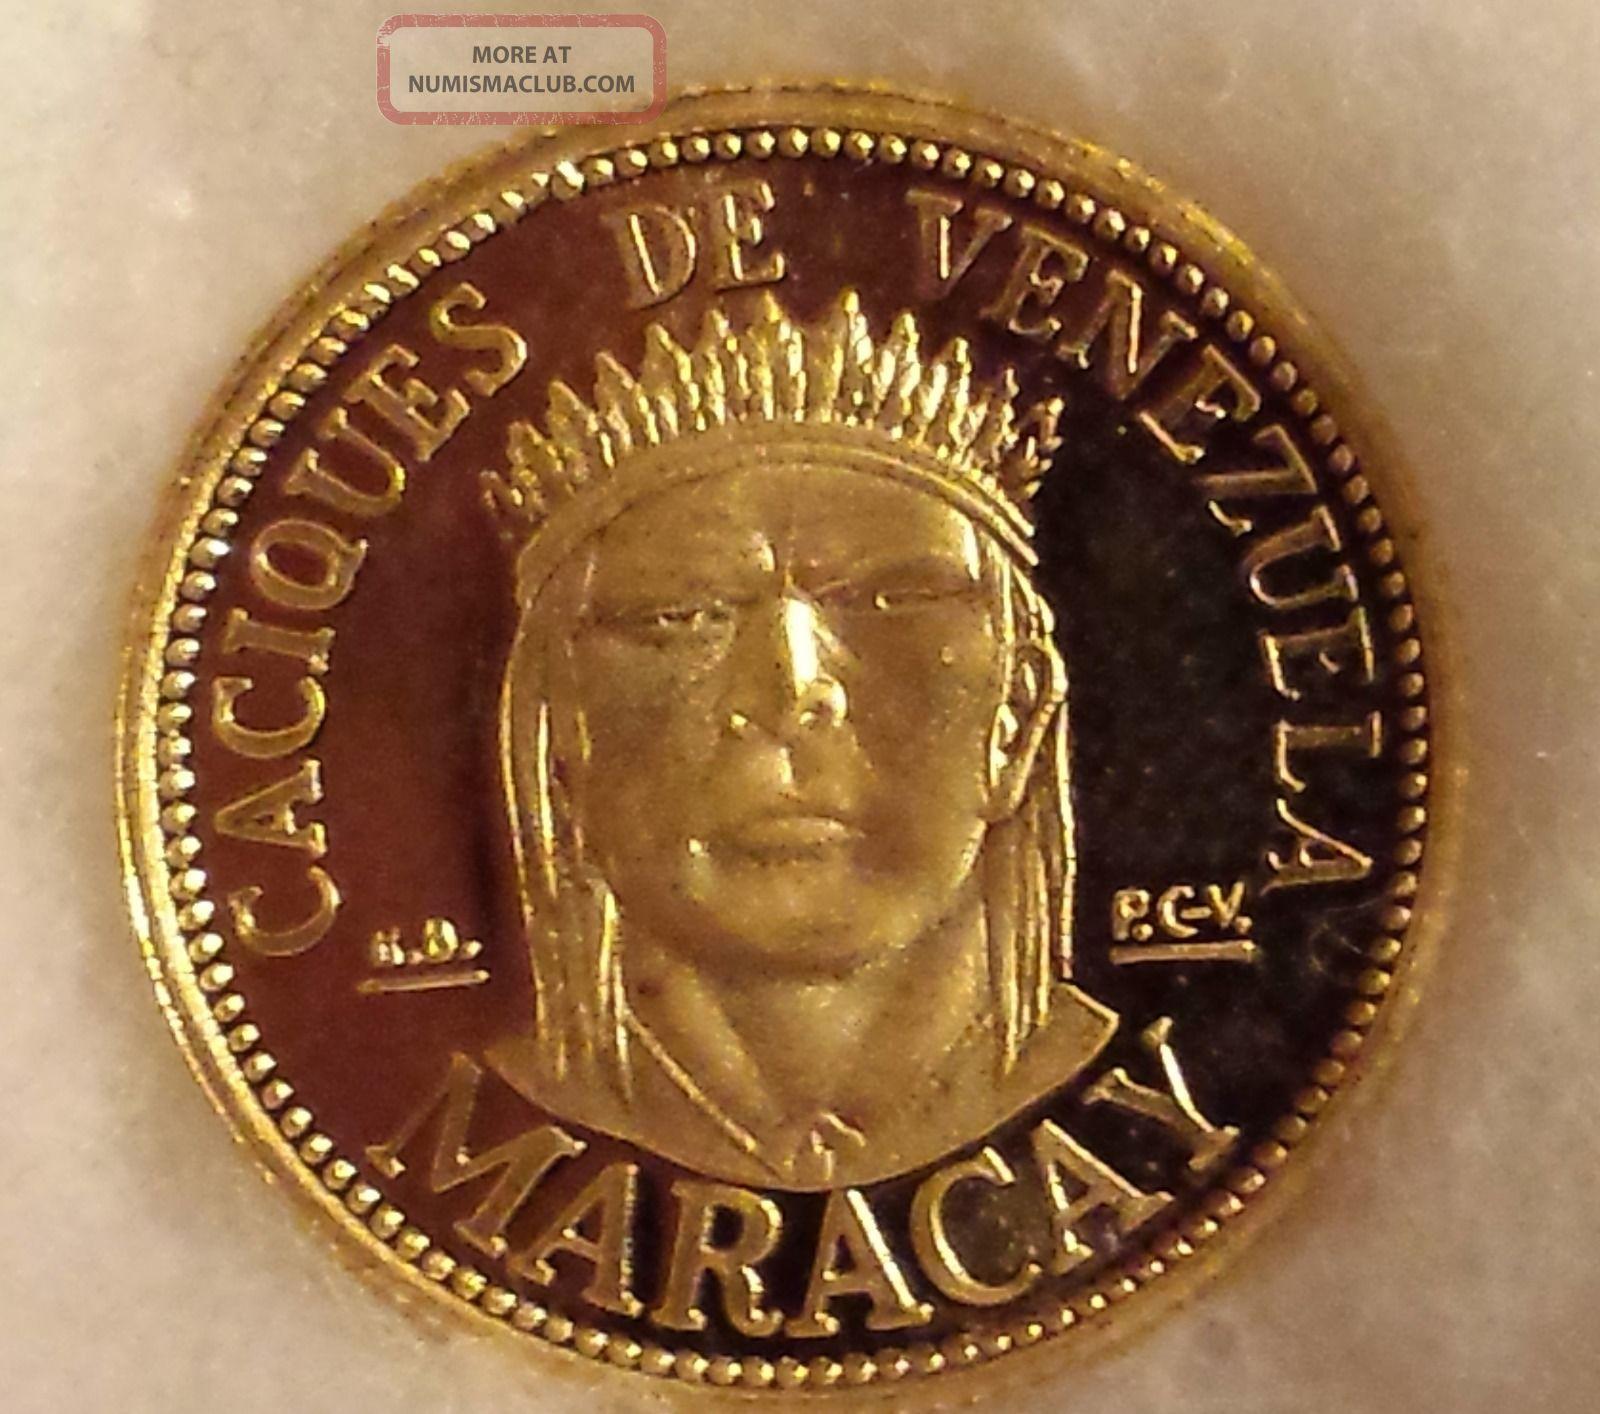 Gold Coin Caciques De Venezuela Maracay Unc 2 5 Grams 900